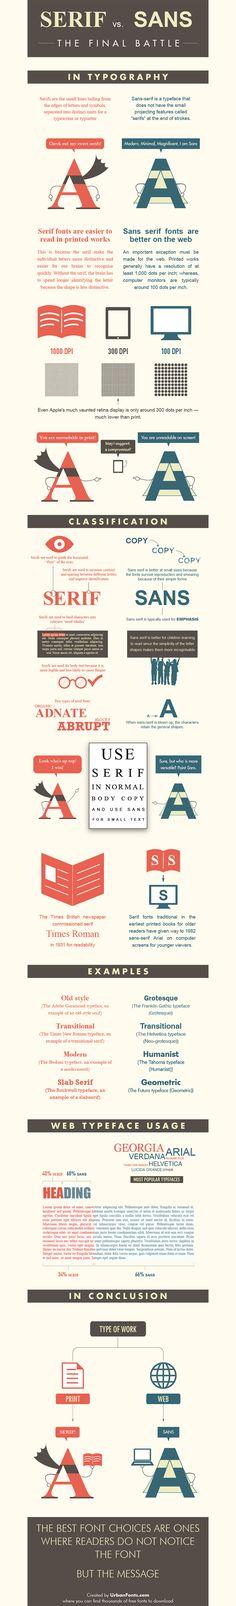 Serif vs Sans Serif #infographic #font #serif